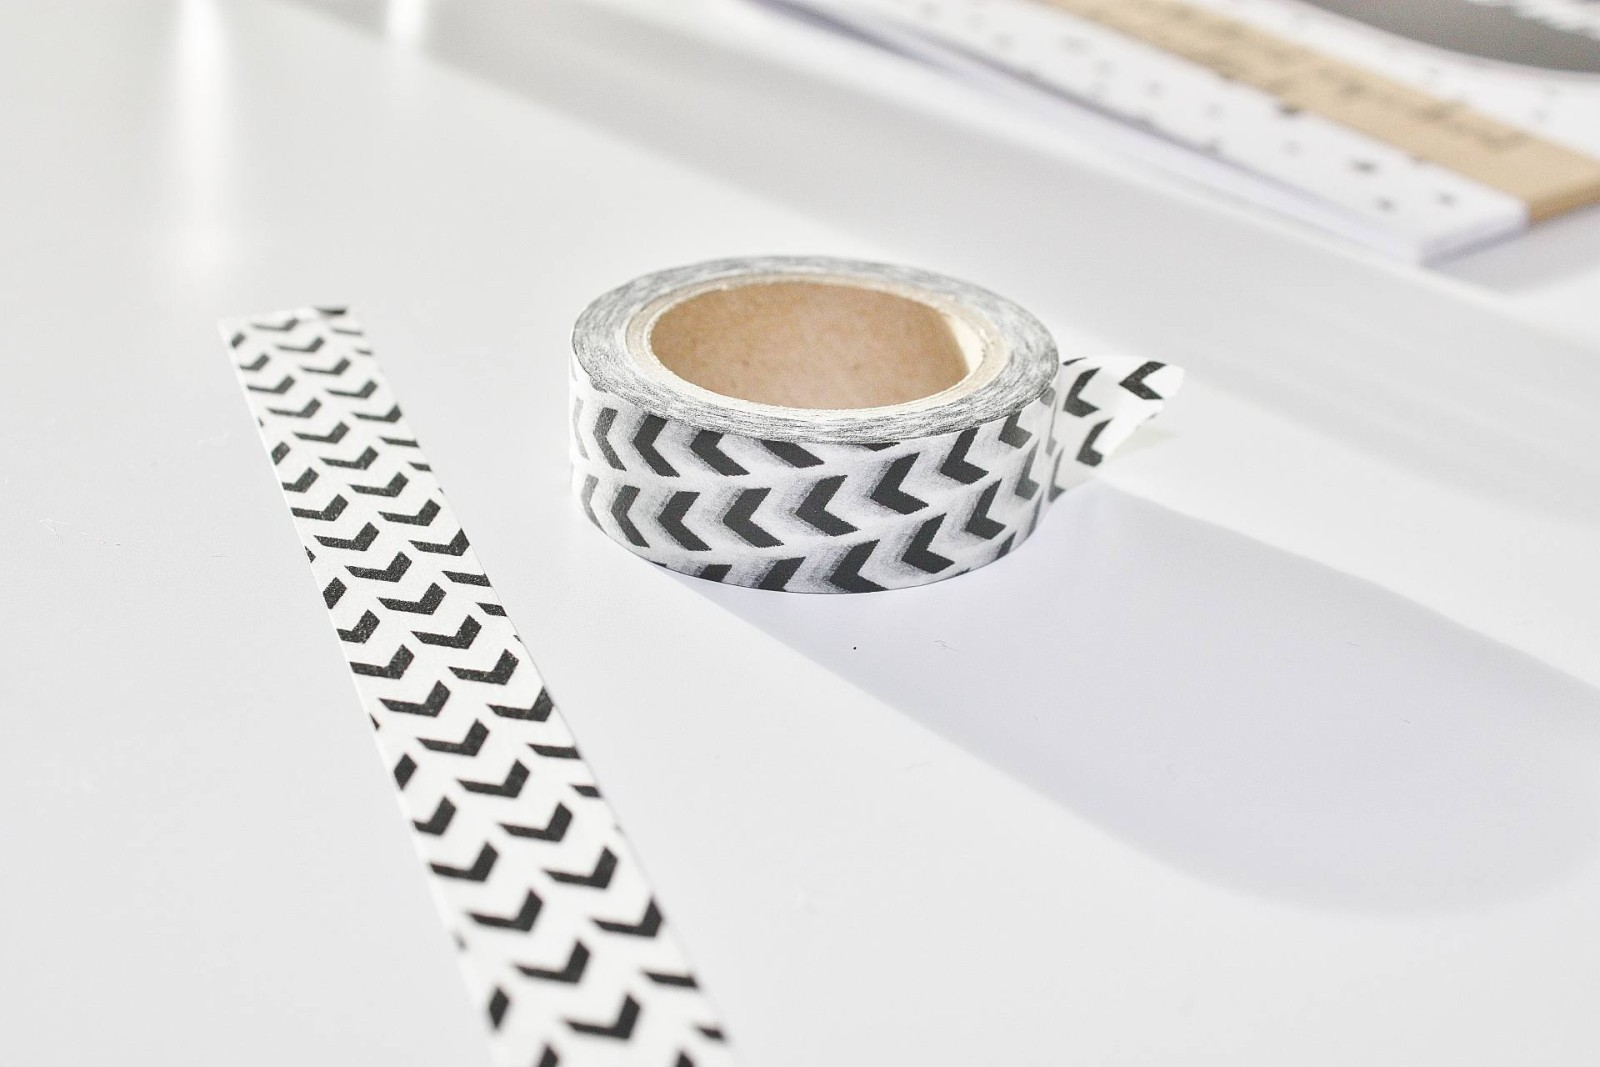 Monochrome Desk Essentials